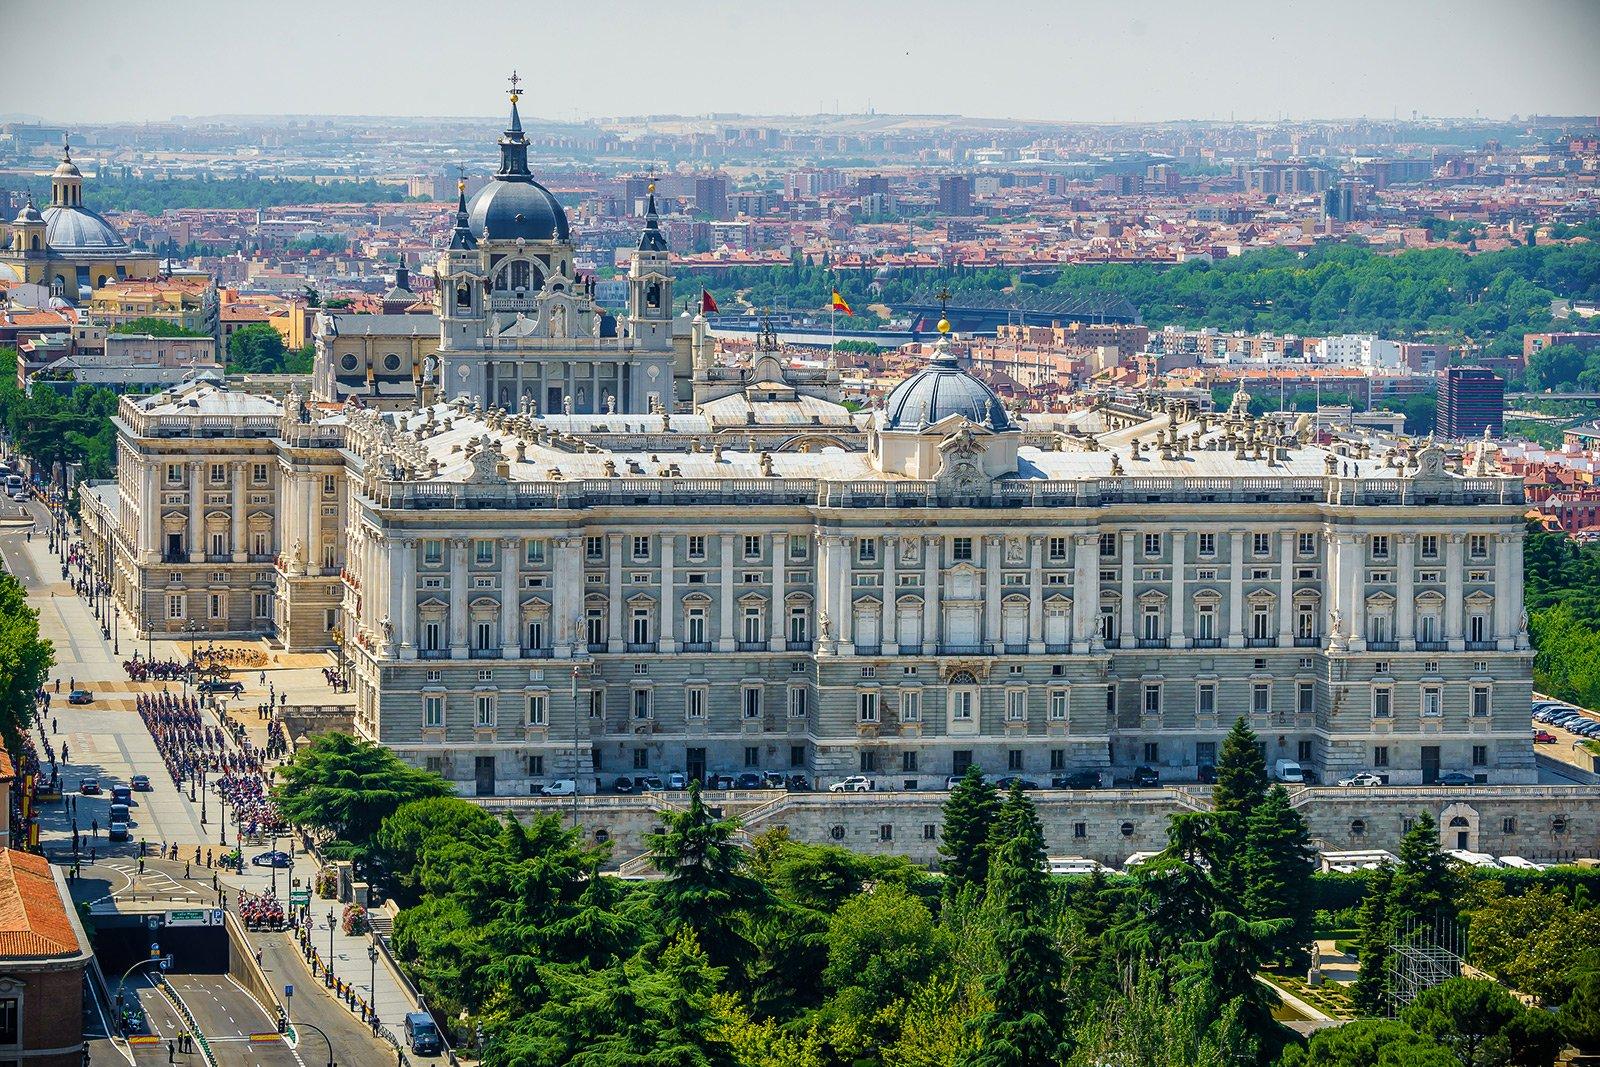 Royal palace of madrid madrid